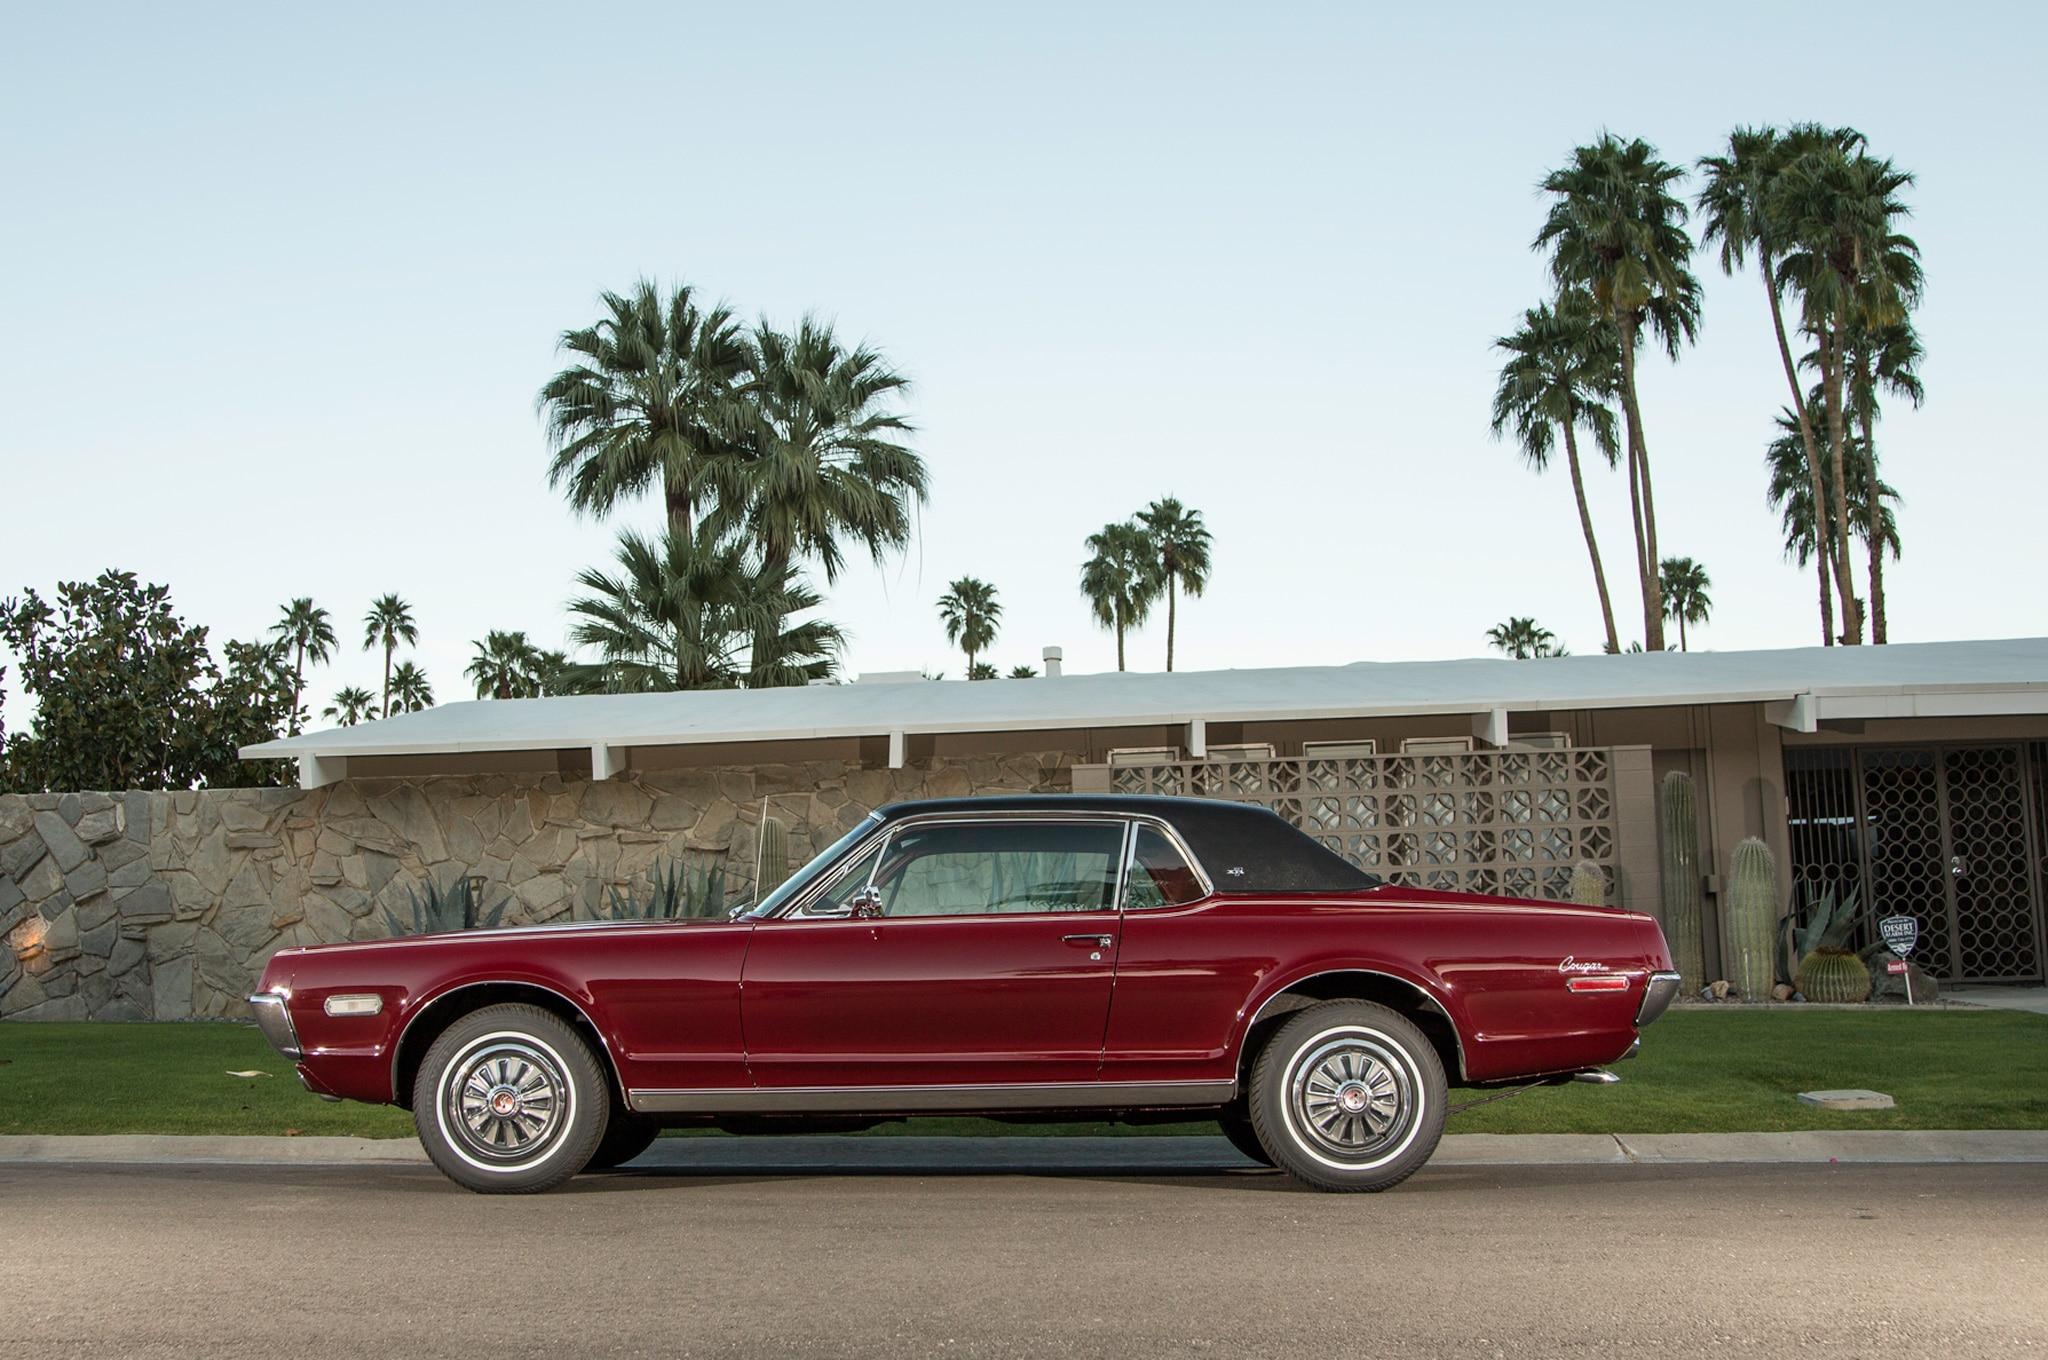 2015 Mercury Cougar >> Collectible Classic: 1967-1968 Mercury Cougar XR-7